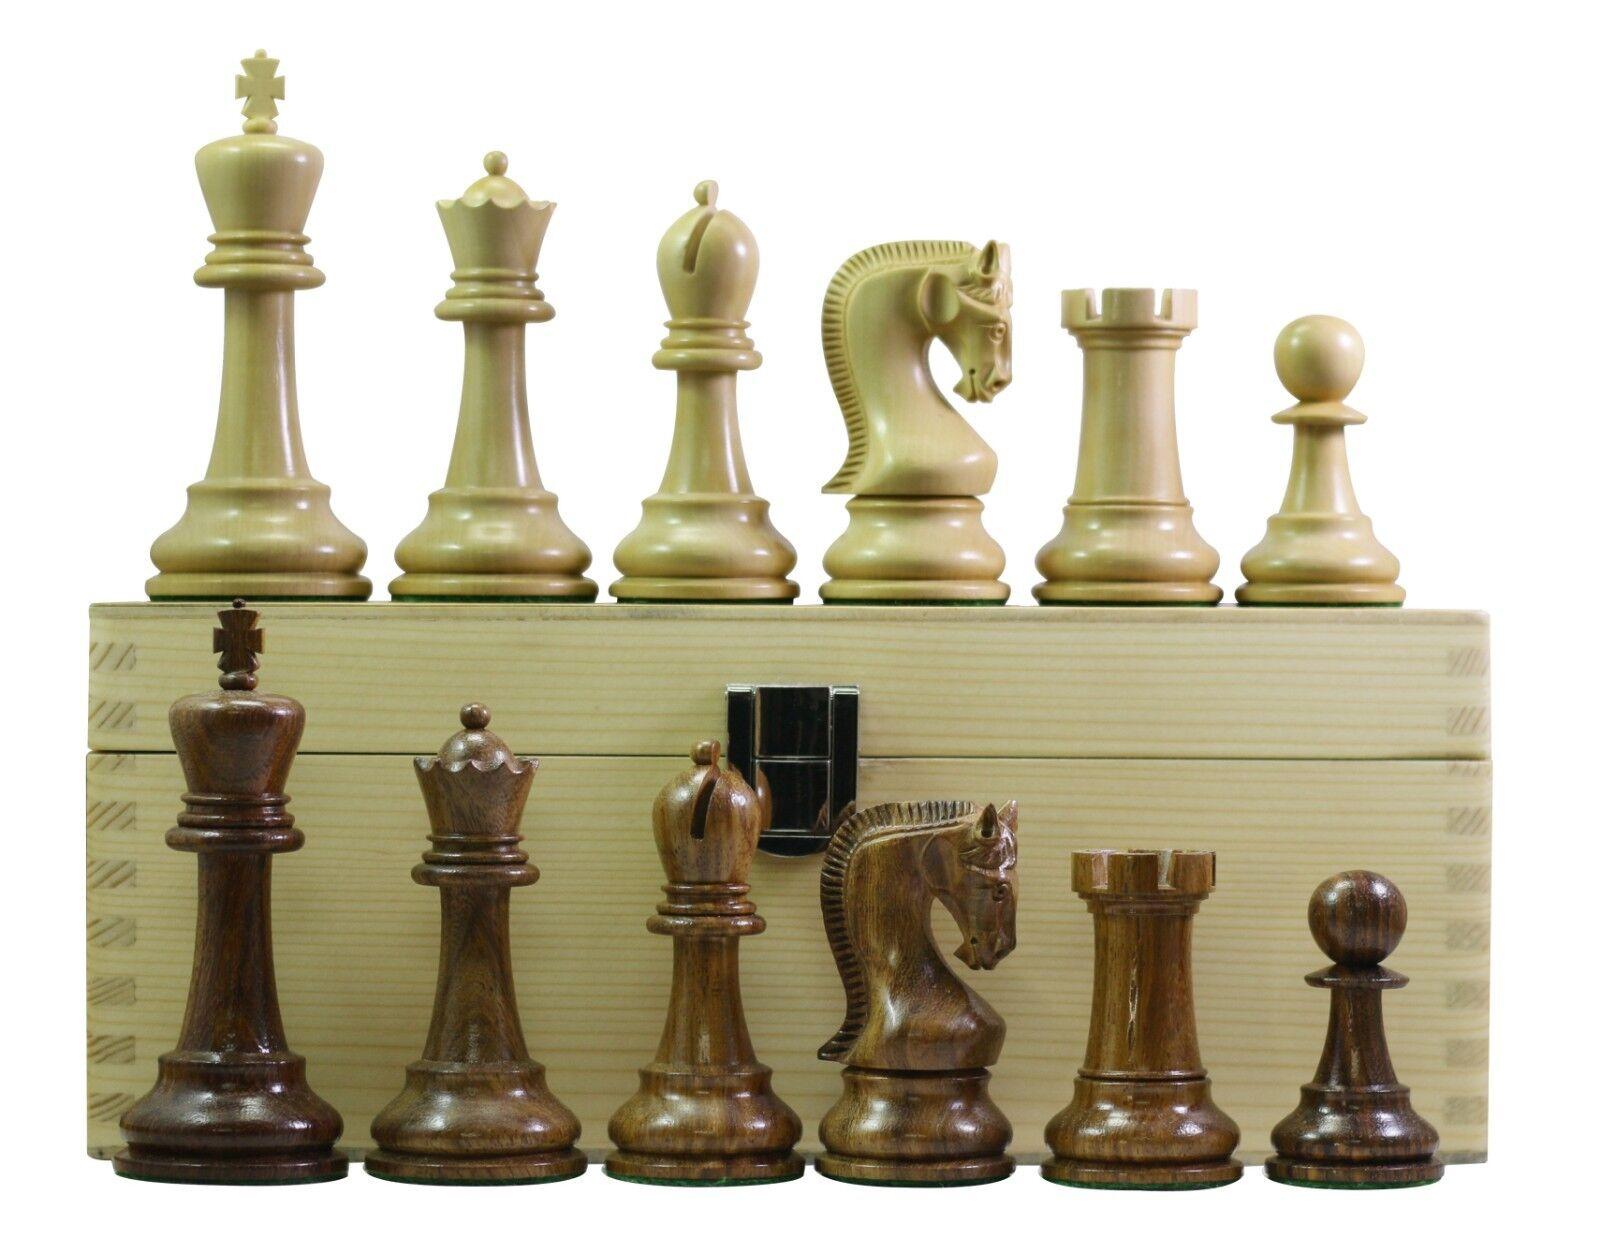 Leningrade Staunton 4  Chess Set in oroen rosadodo & Box Wood with Storage Box